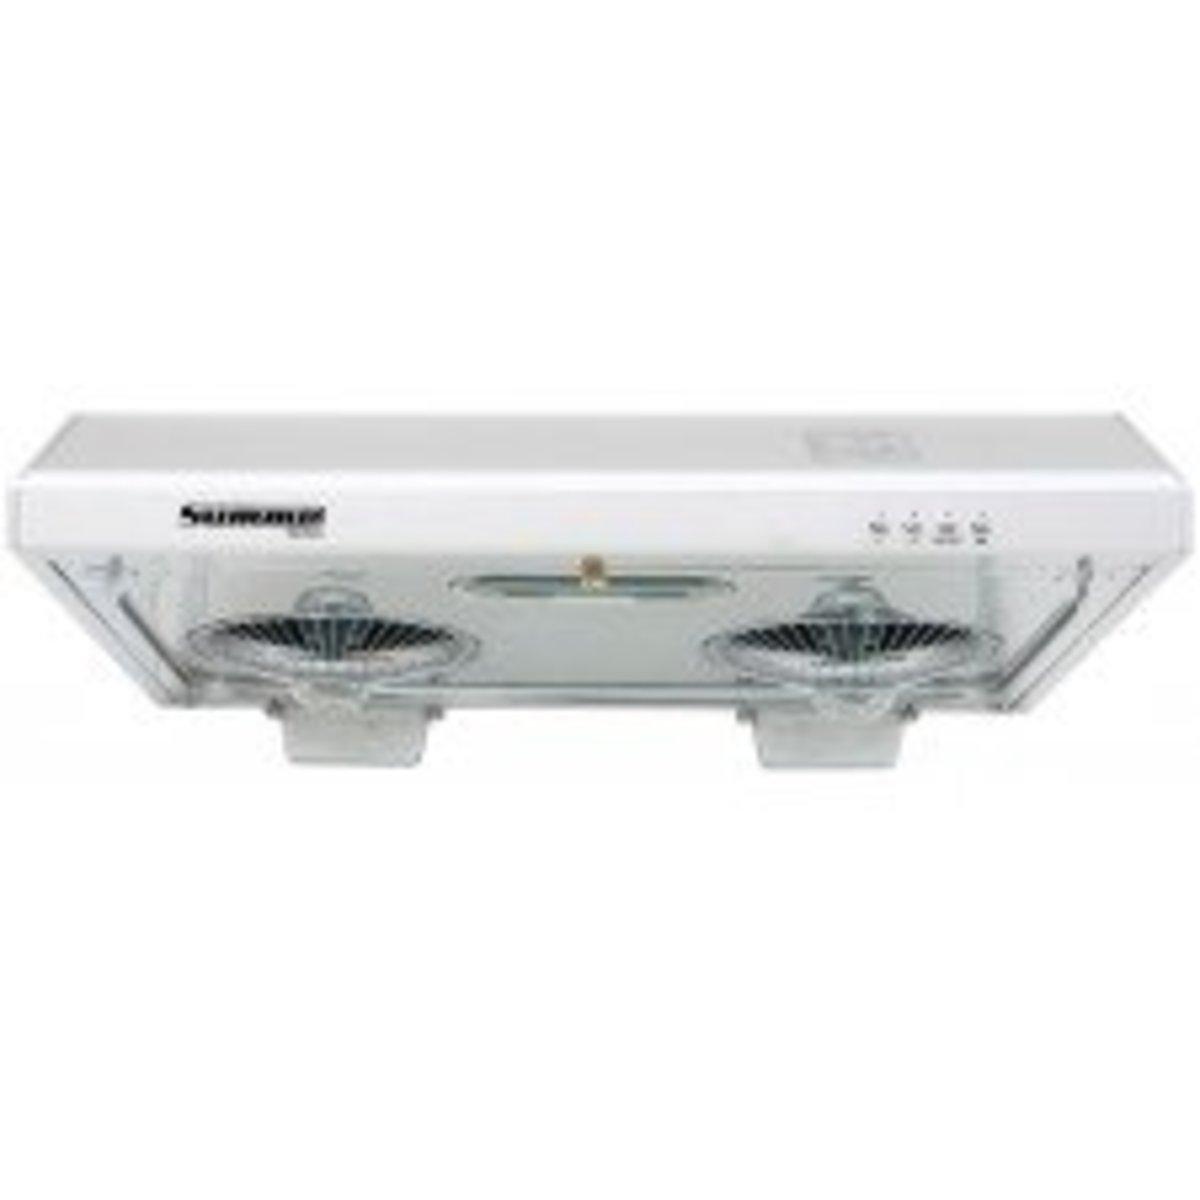 "FV-711N ""Sirocco"" Range Hood (Switch button design) (LED lamp model) Silver"